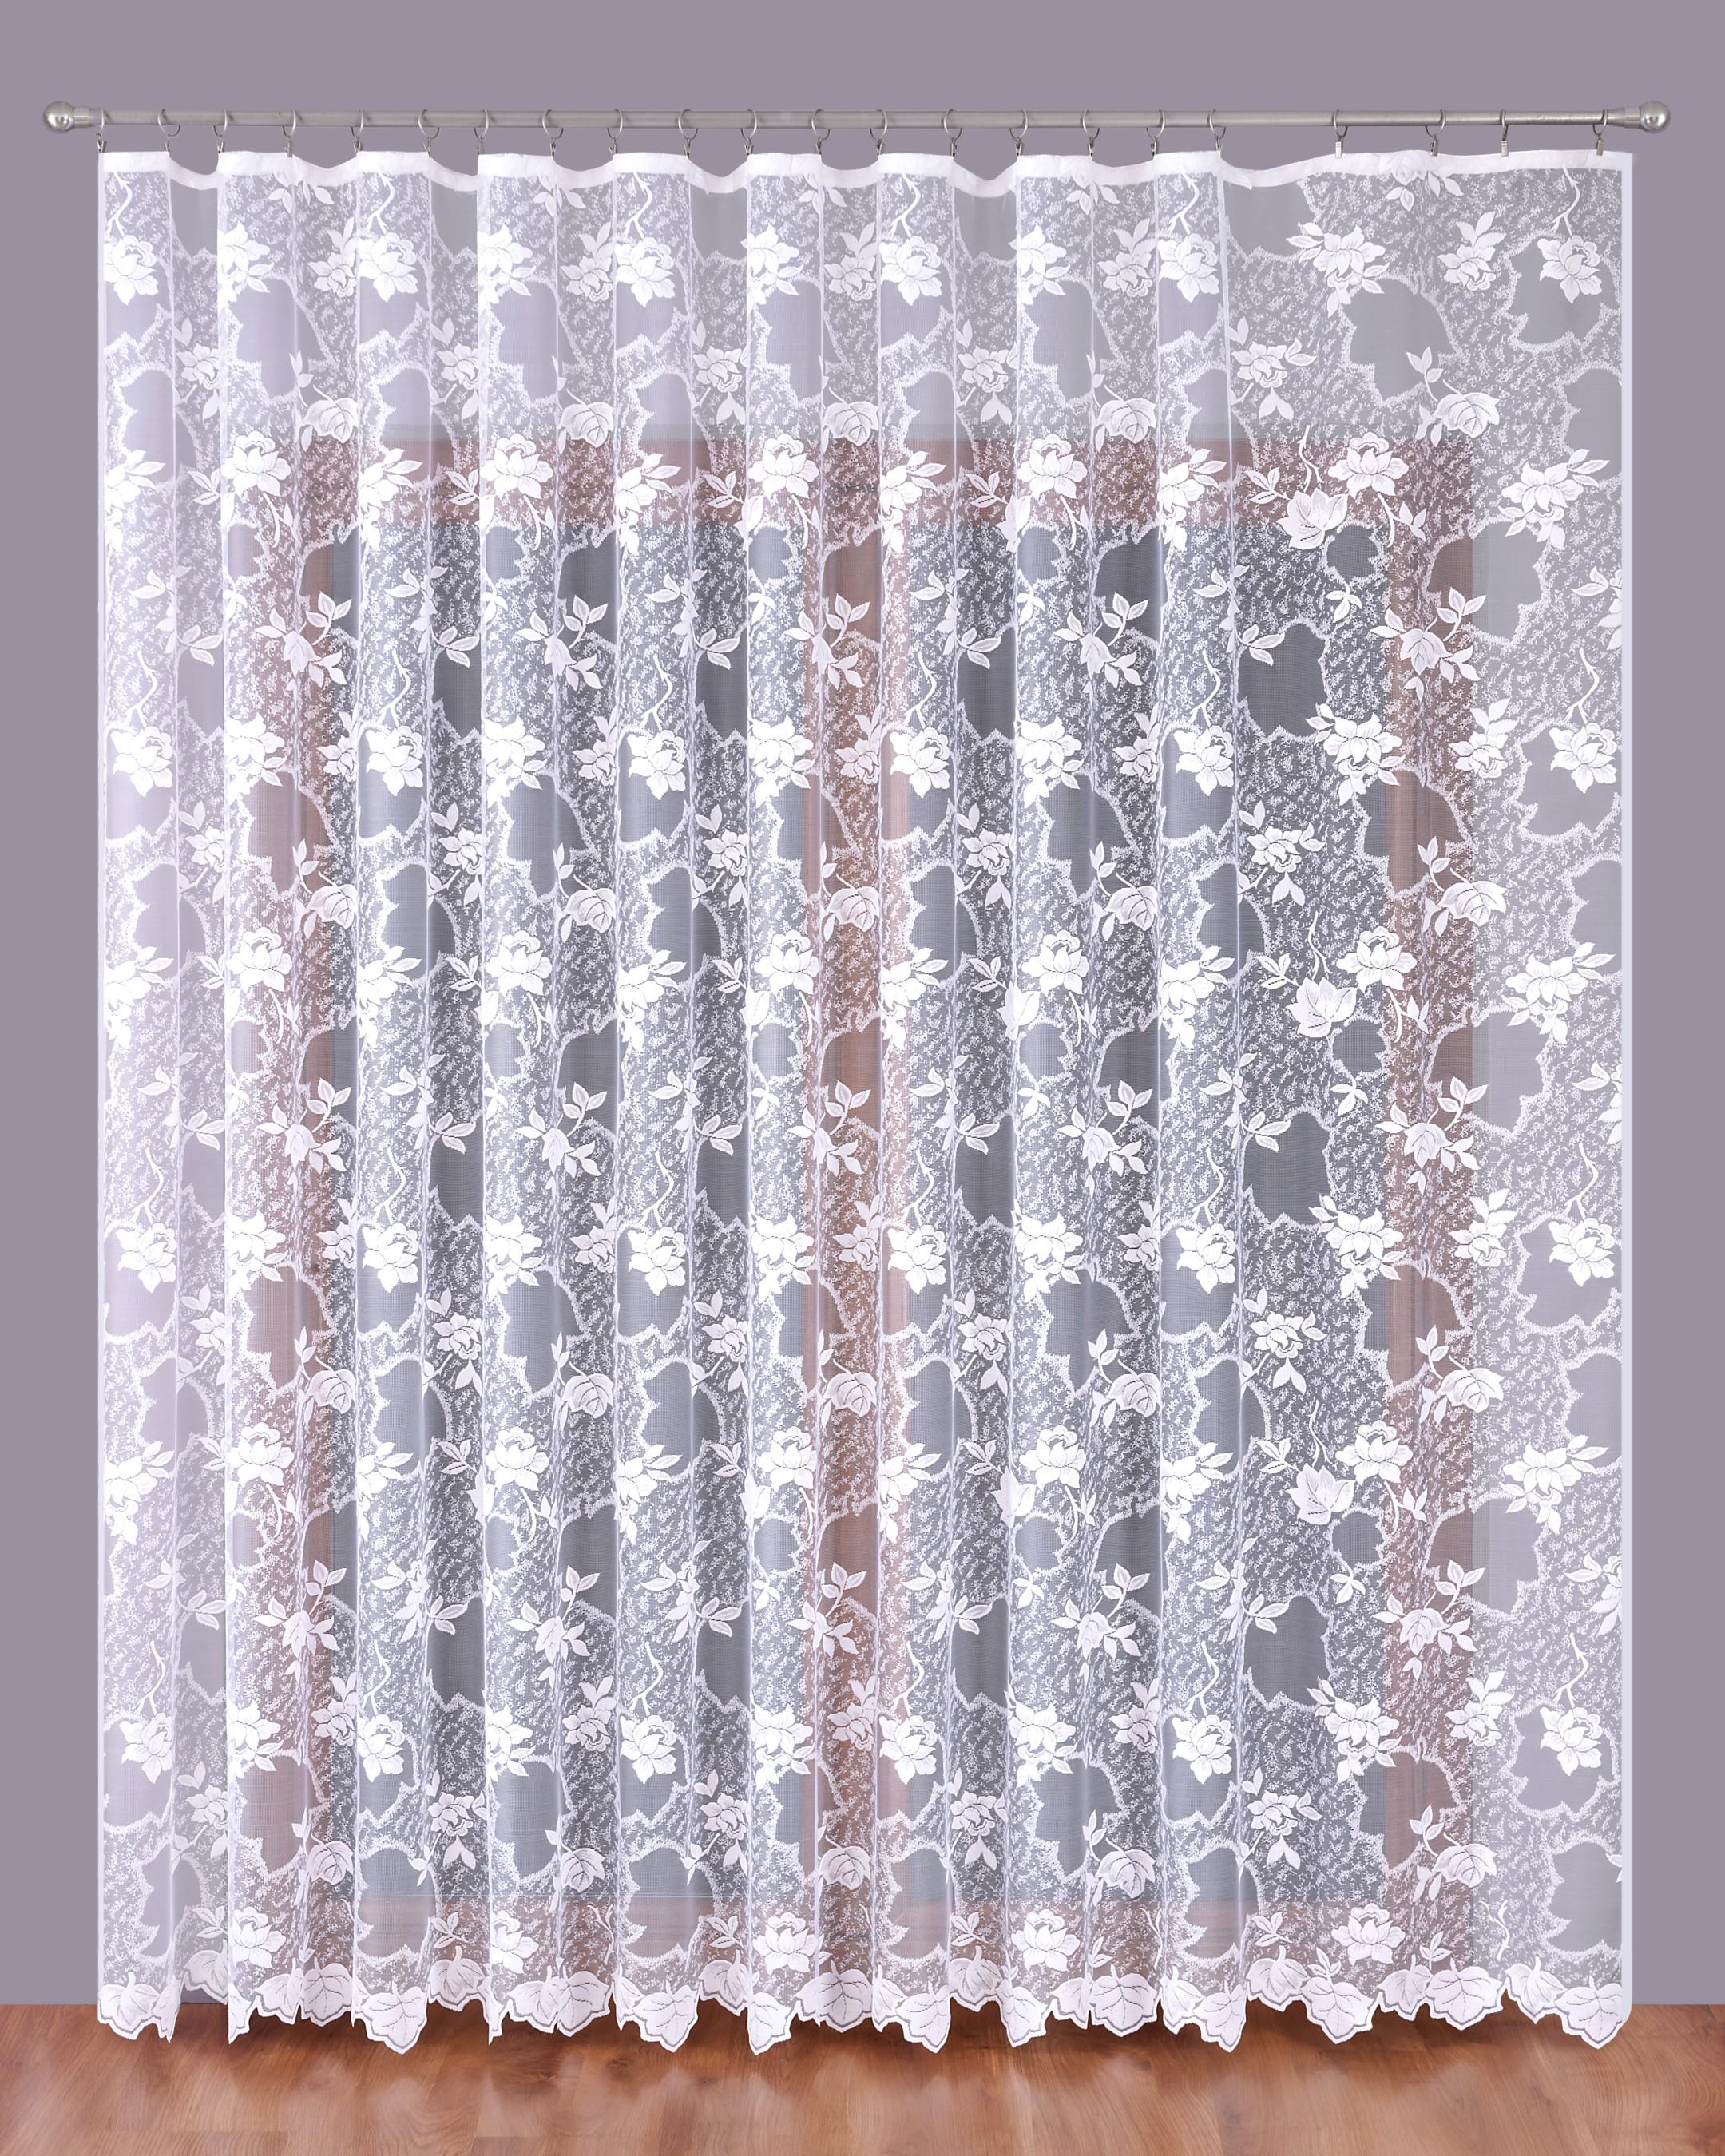 Шторы Primavera Классические шторы Luvinia Цвет: Белый шторы primavera классические шторы luvinia цвет кремовый